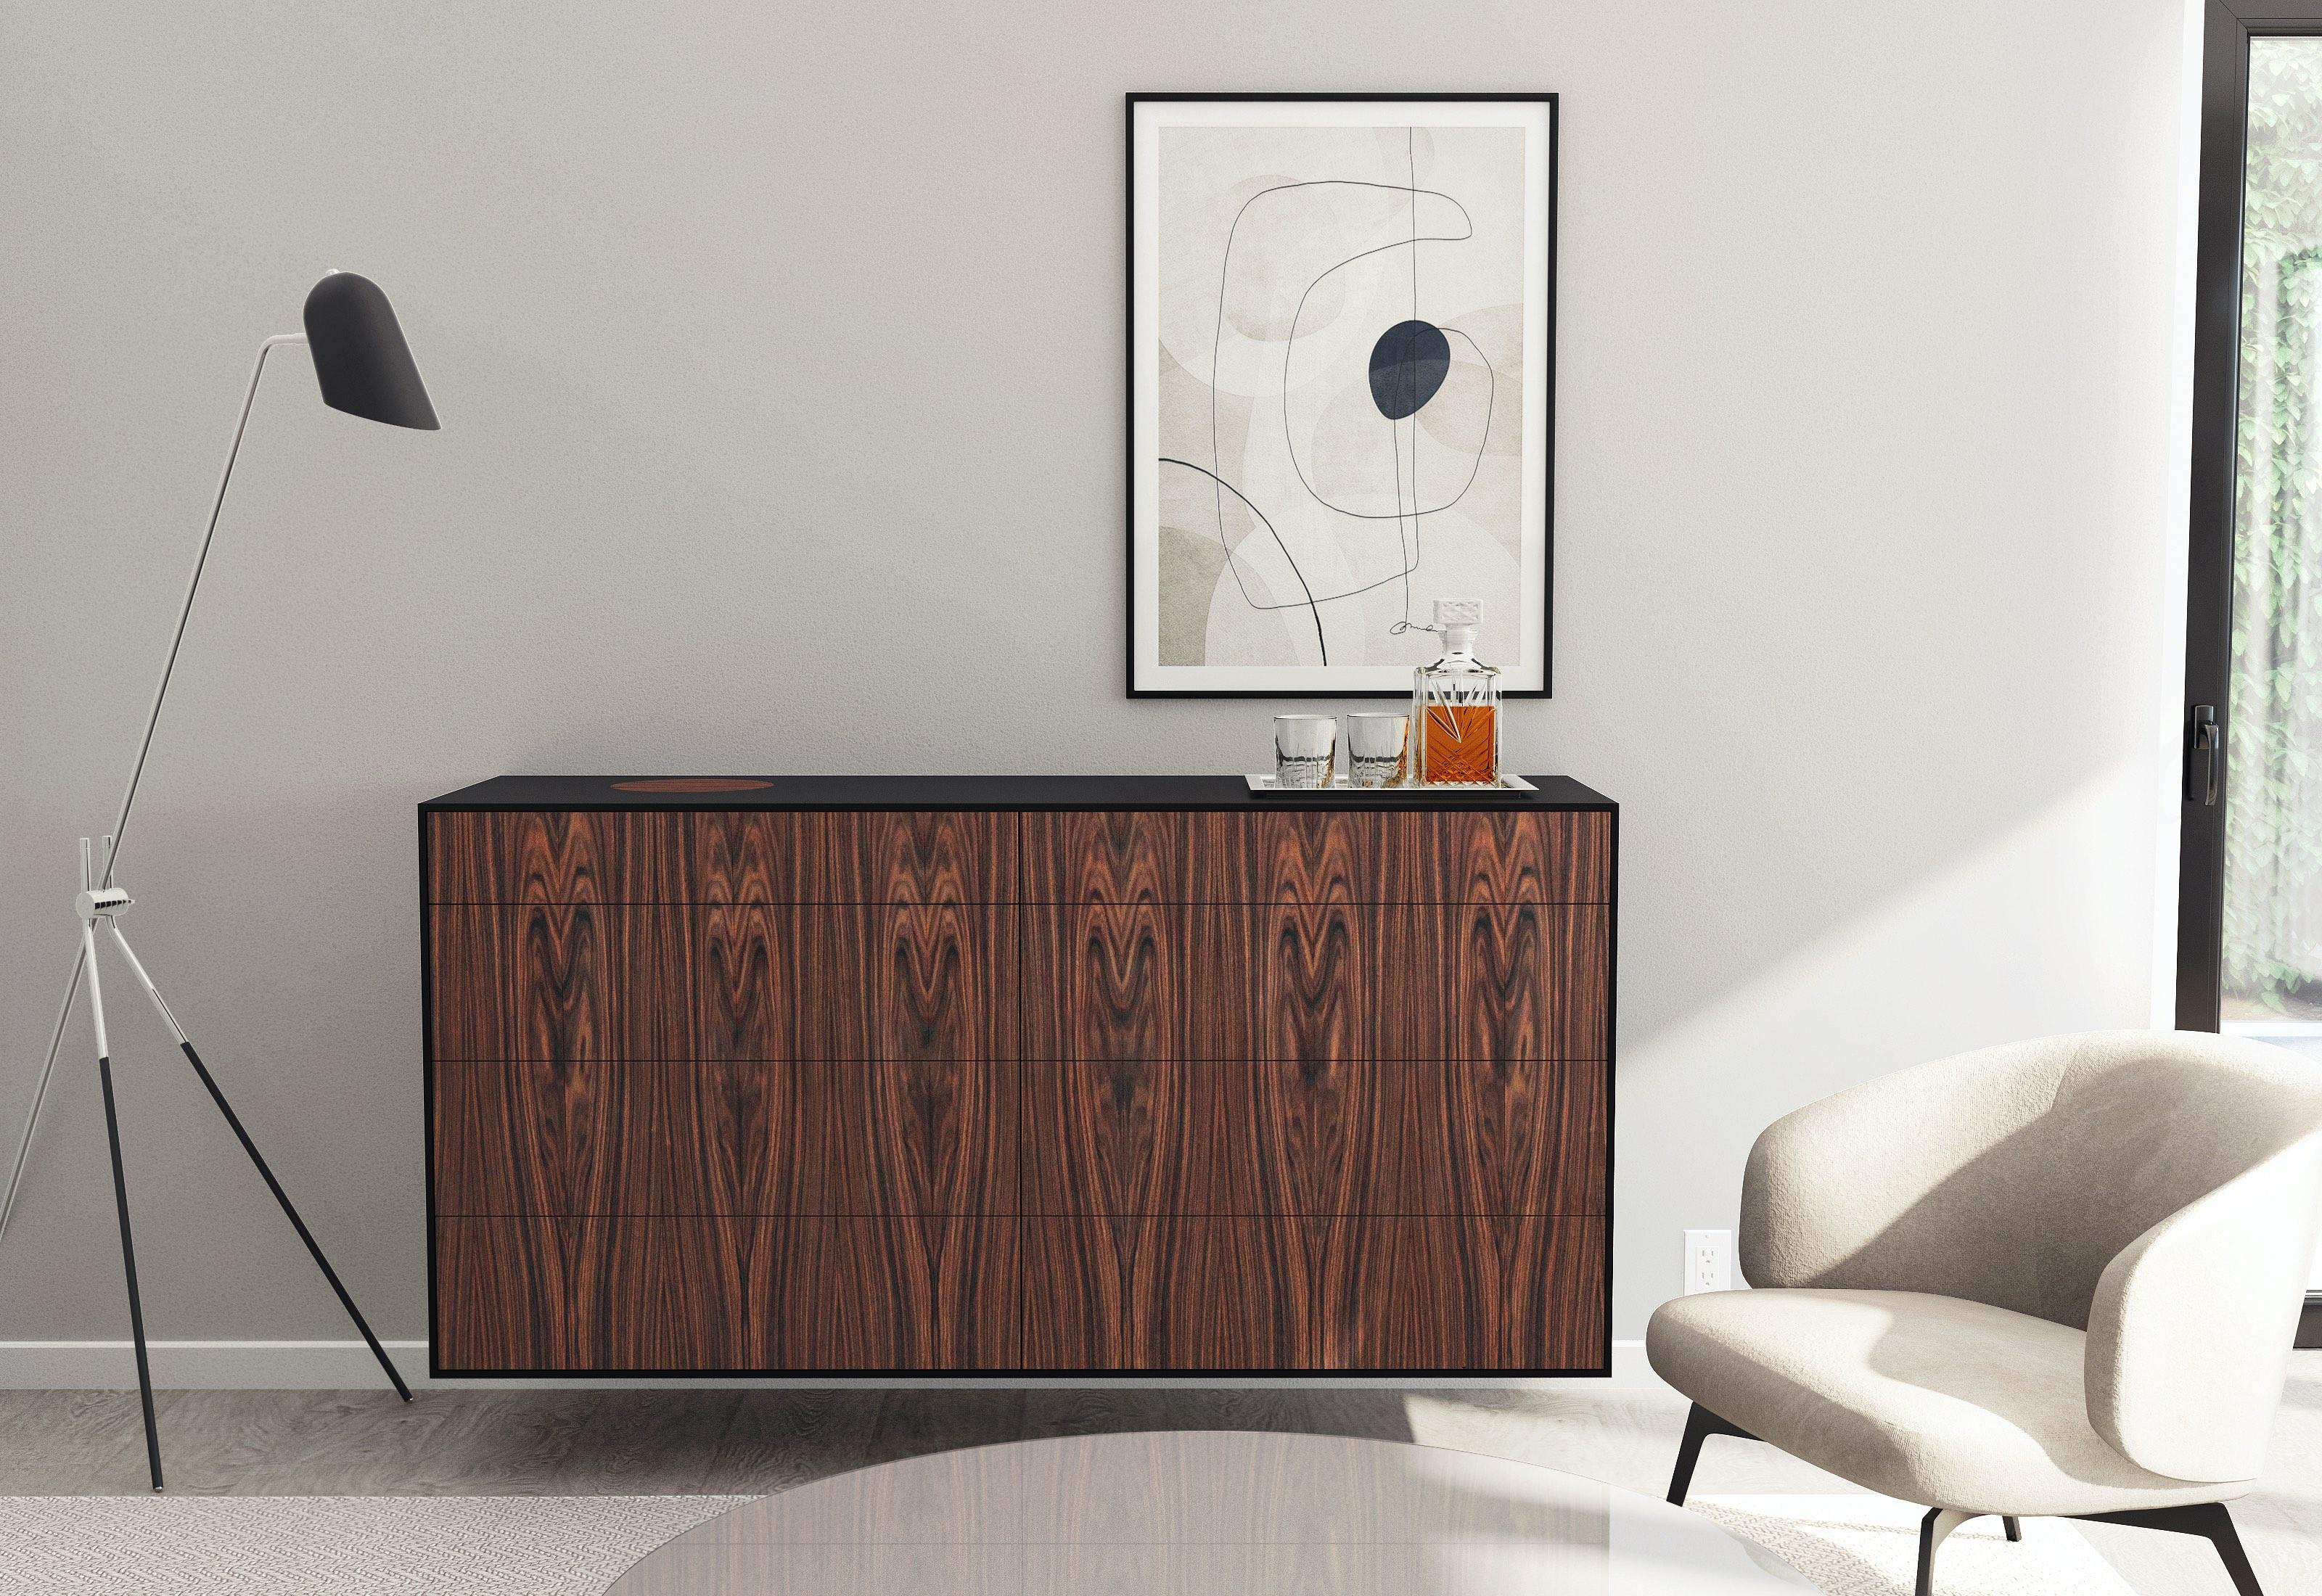 Collection de mobilier